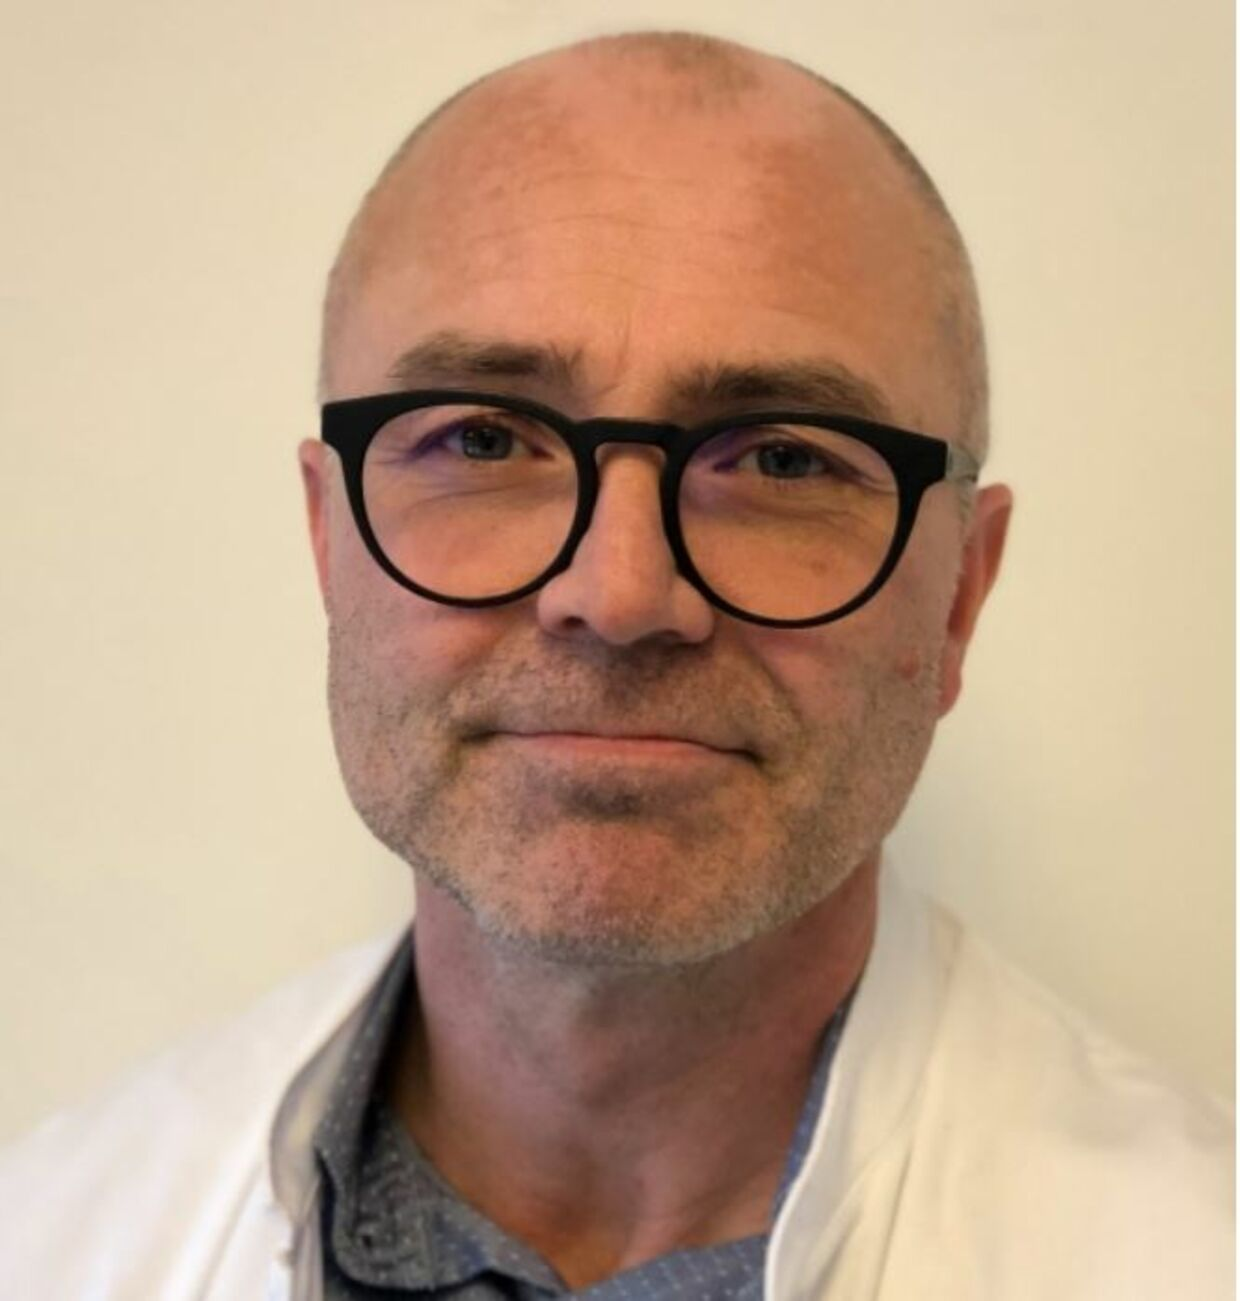 Lægefaglig direktør hos Region Nordjylland Thomas Larsen. Foto: Region Nordjylland